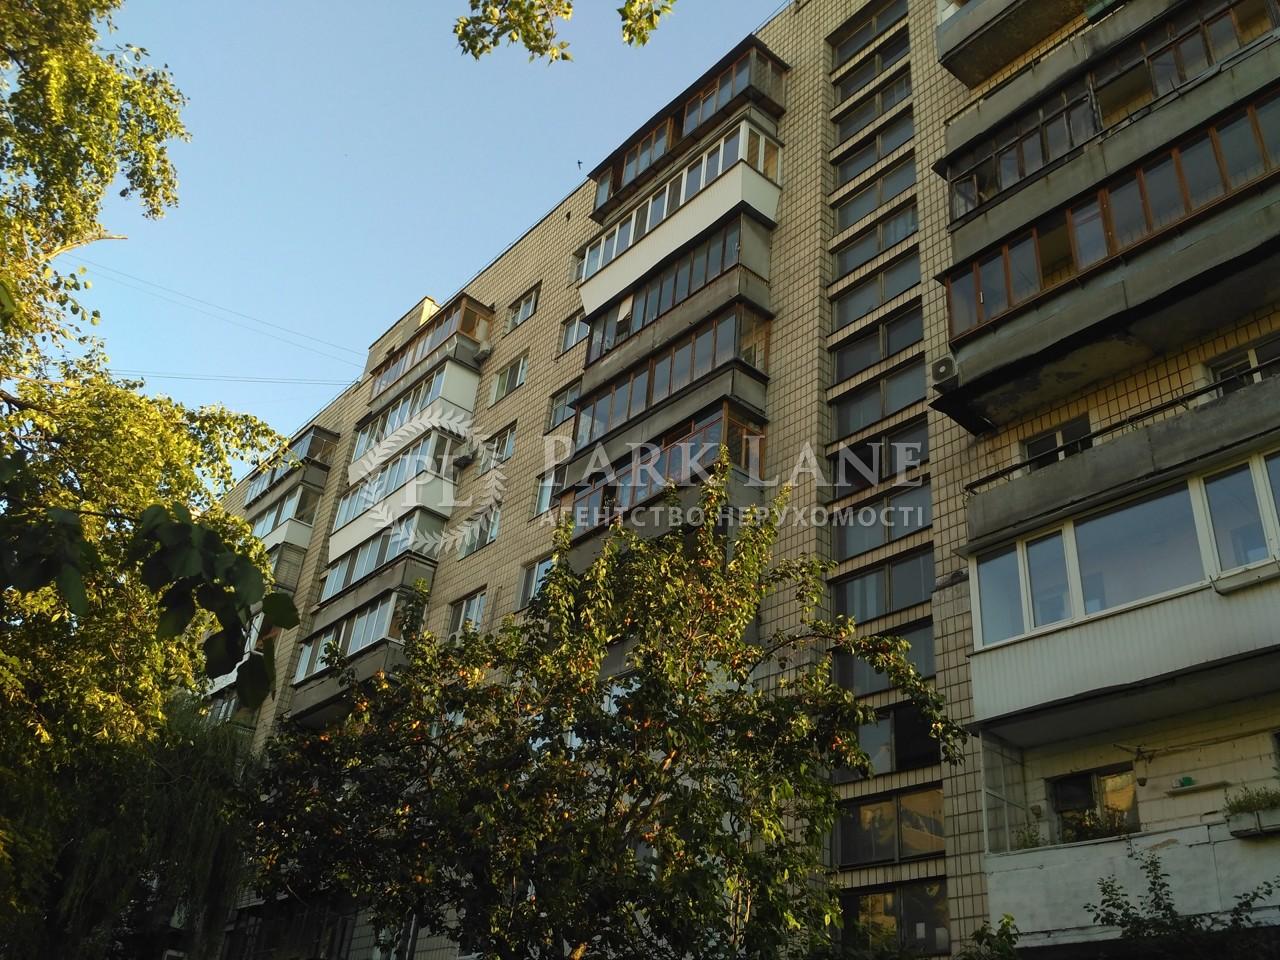 Квартира ул. Малокитаевская, 3, Киев, Z-944125 - Фото 15